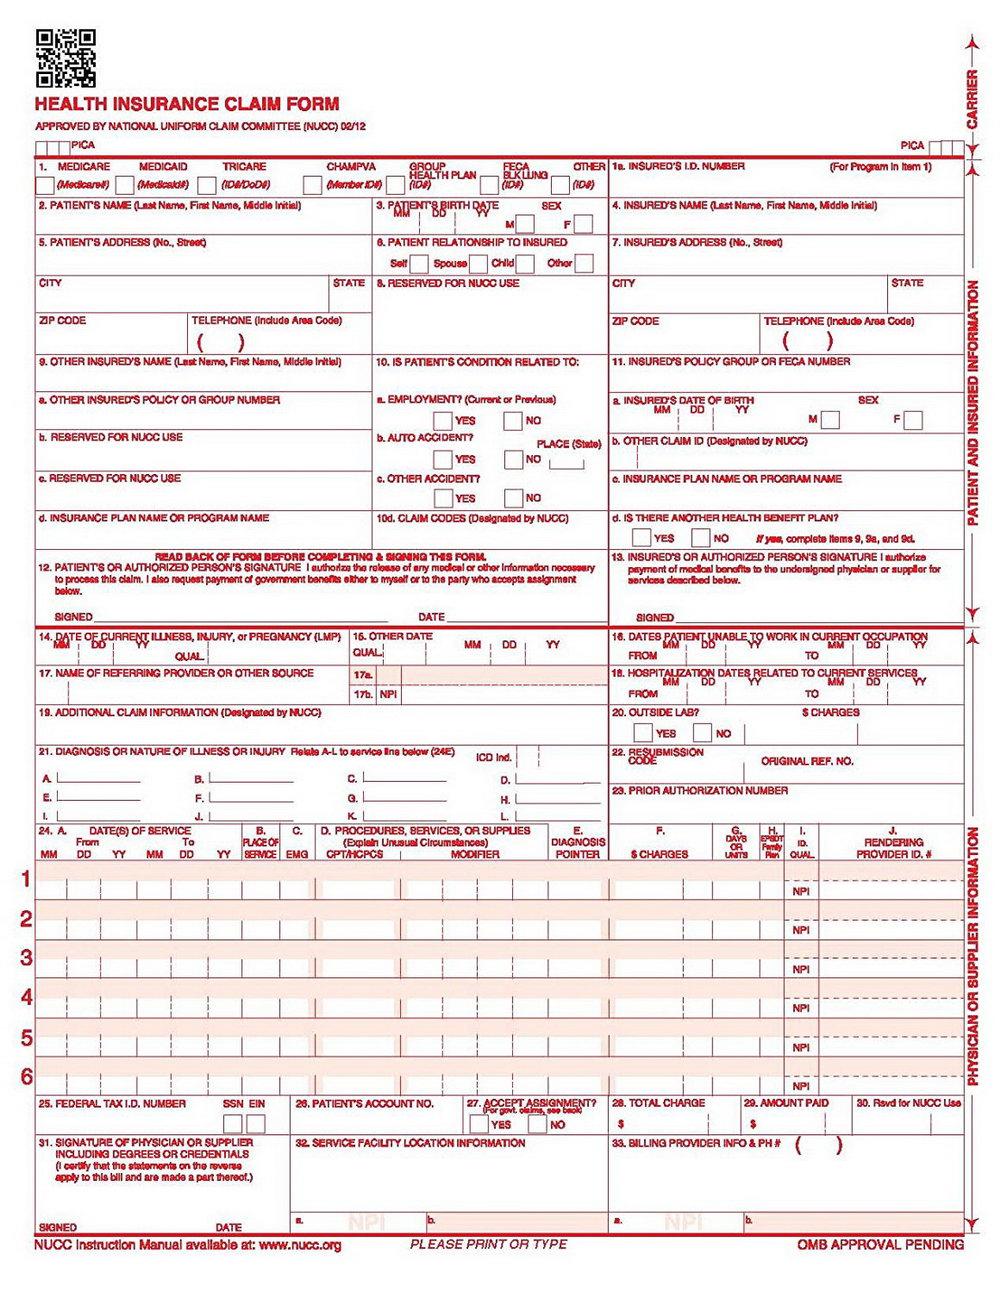 Hcfa 1500 Form Pdf